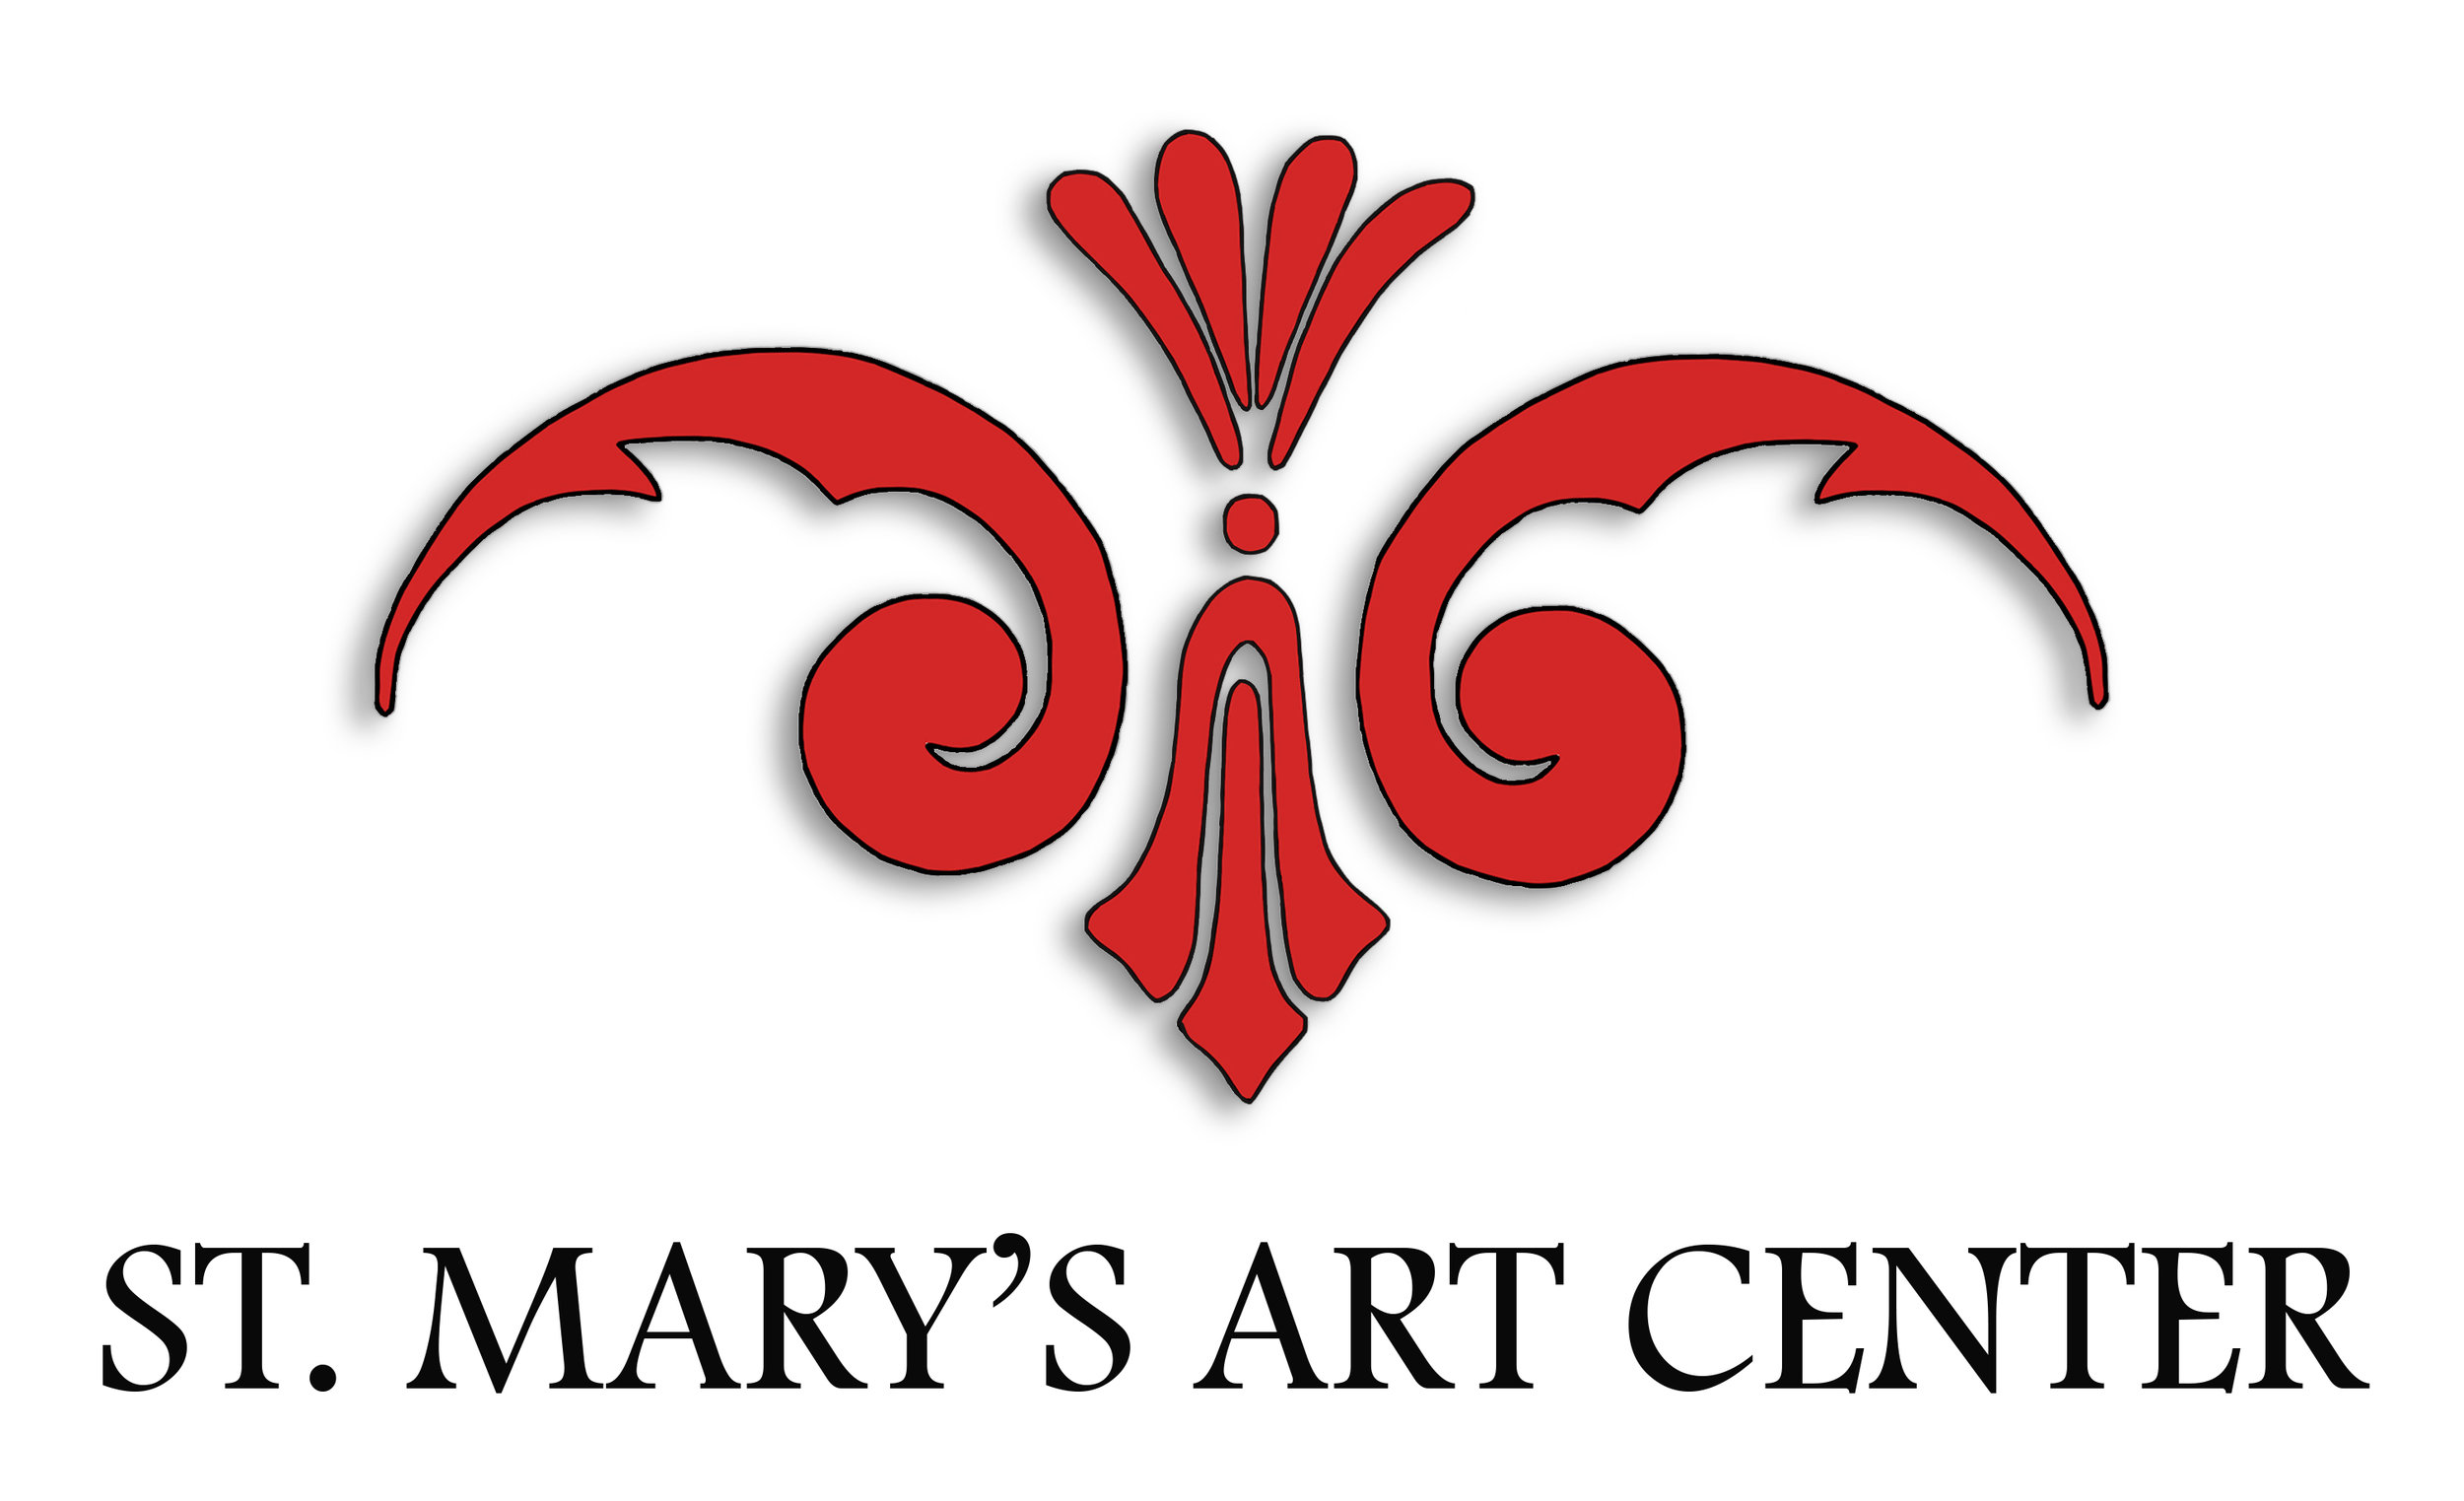 ST. MARY'S ART CENTER BRANDING & LOGO  branding and logo designs for Virginia City, Nevada Nonprofit  collaboration with Paula Burris Design